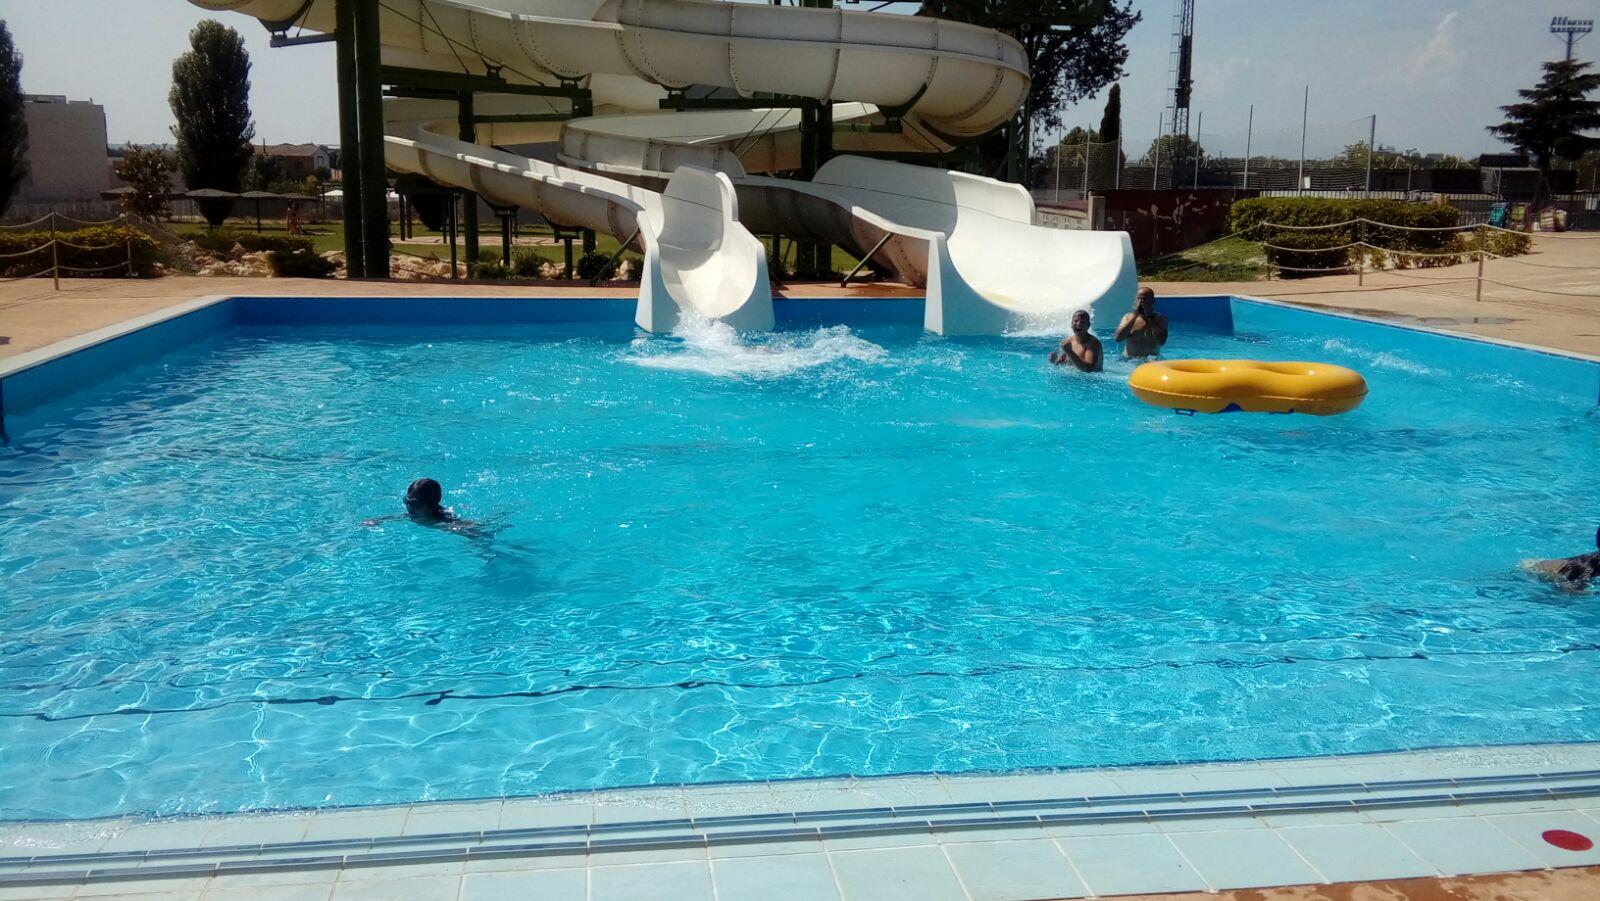 Tarde en la piscina municipal de monz n for Piscinas de monzon